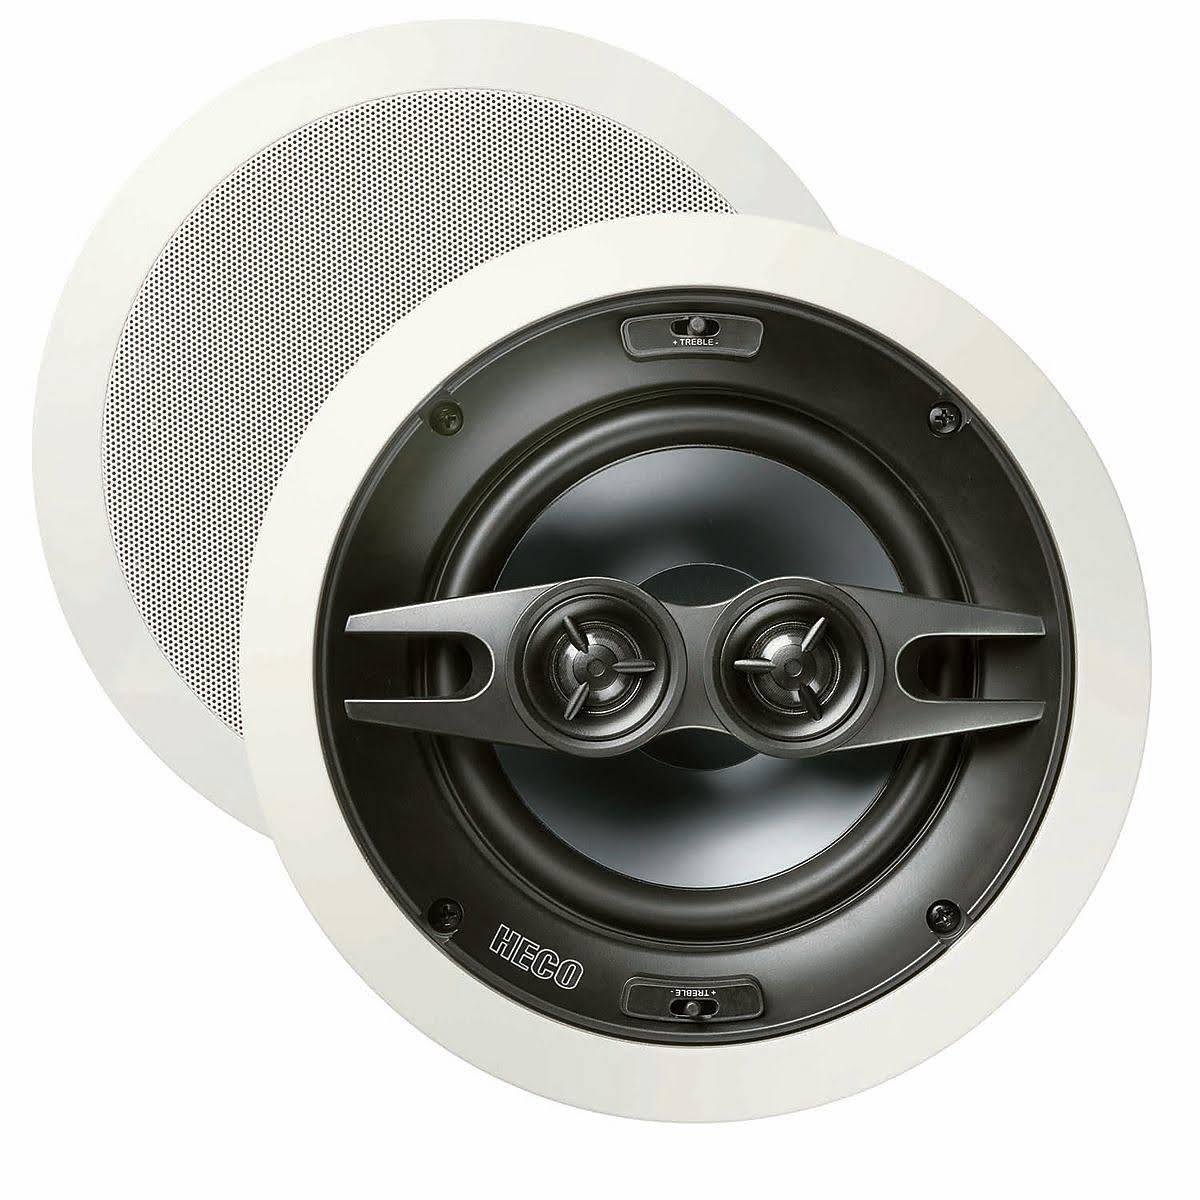 Heco Install INC 2602, High End Decken-Einbaulautsprecher, 2x2-Wege, 100/180 Watt max., 1 Stück, B-Ware